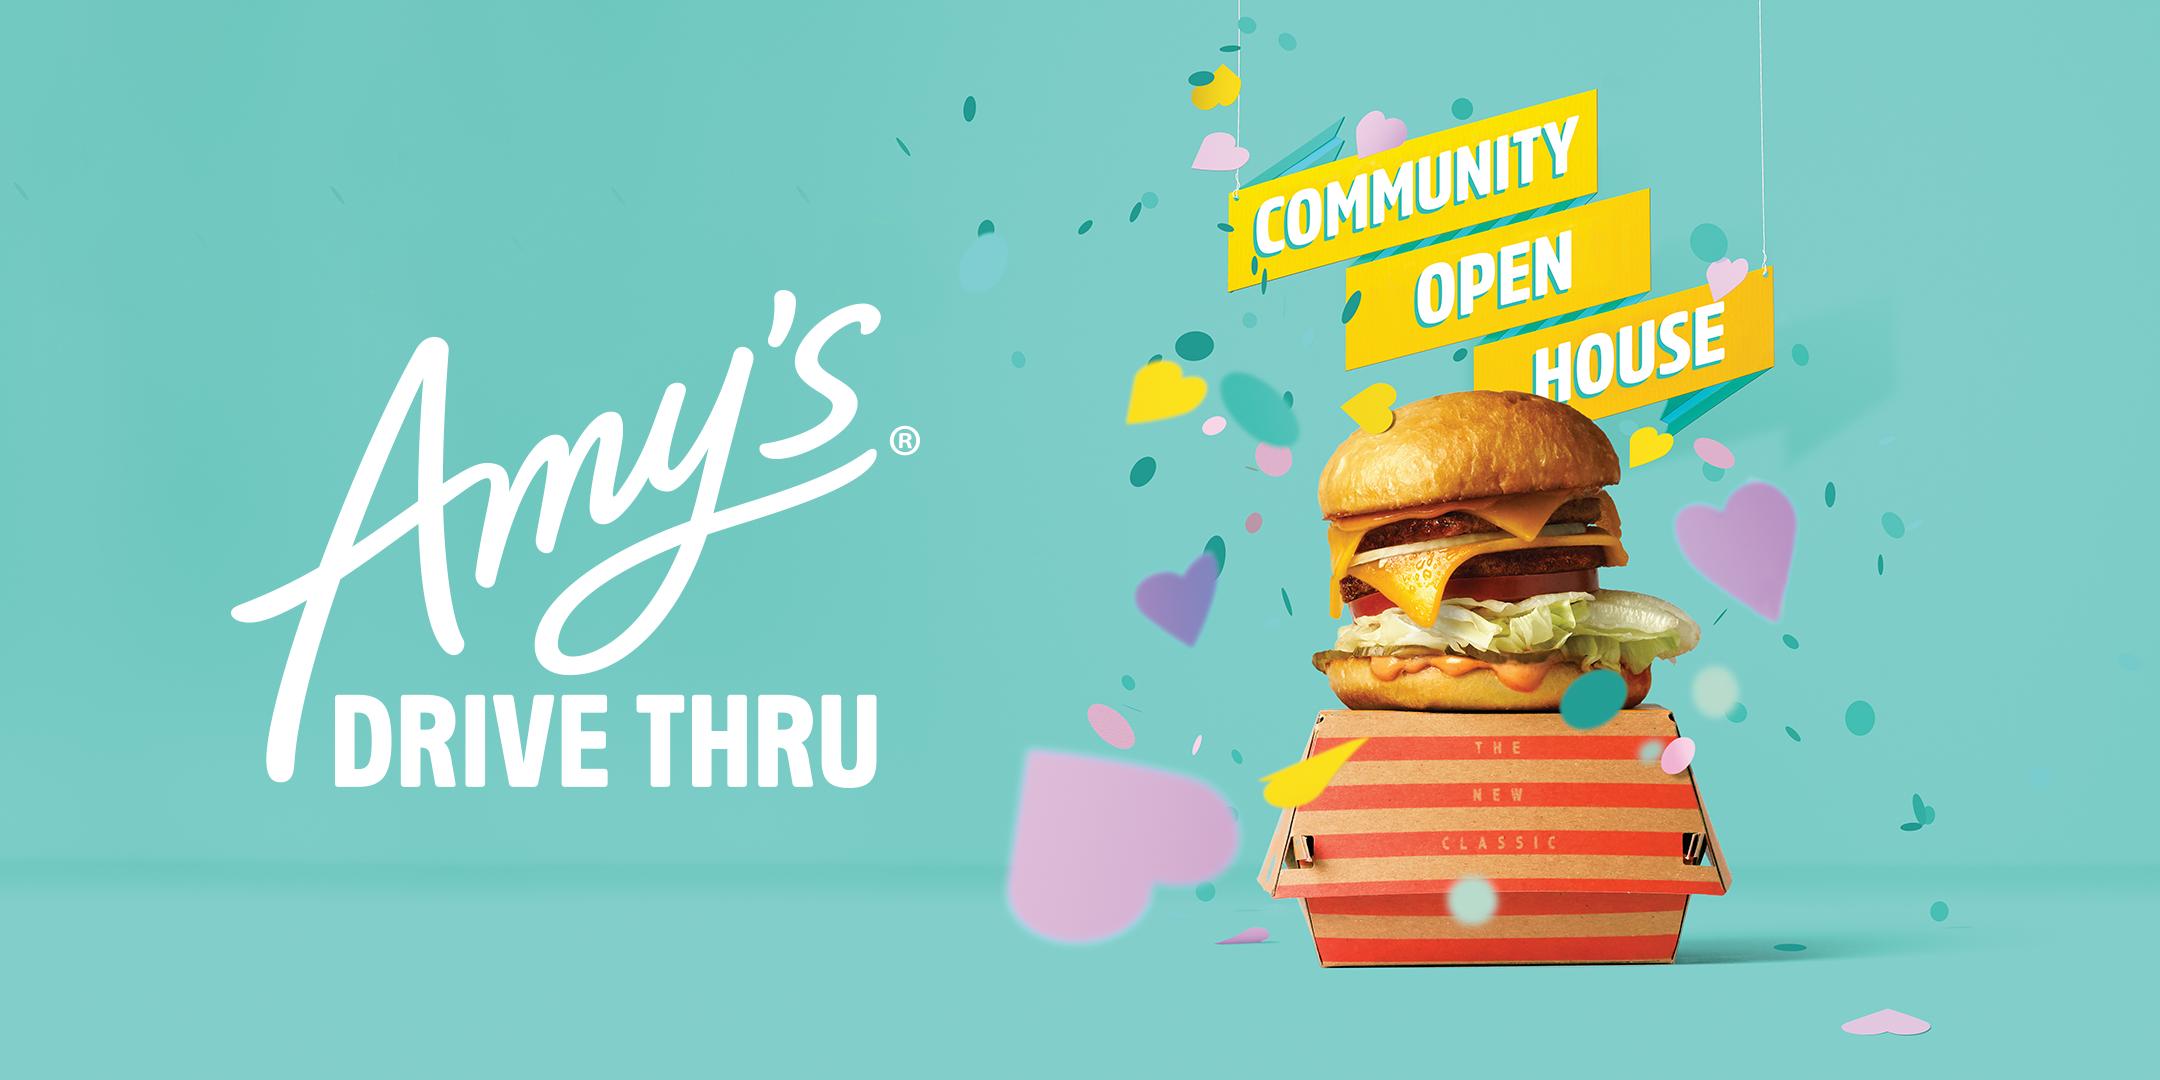 Amy's Drive Thru Marin Community Open House -